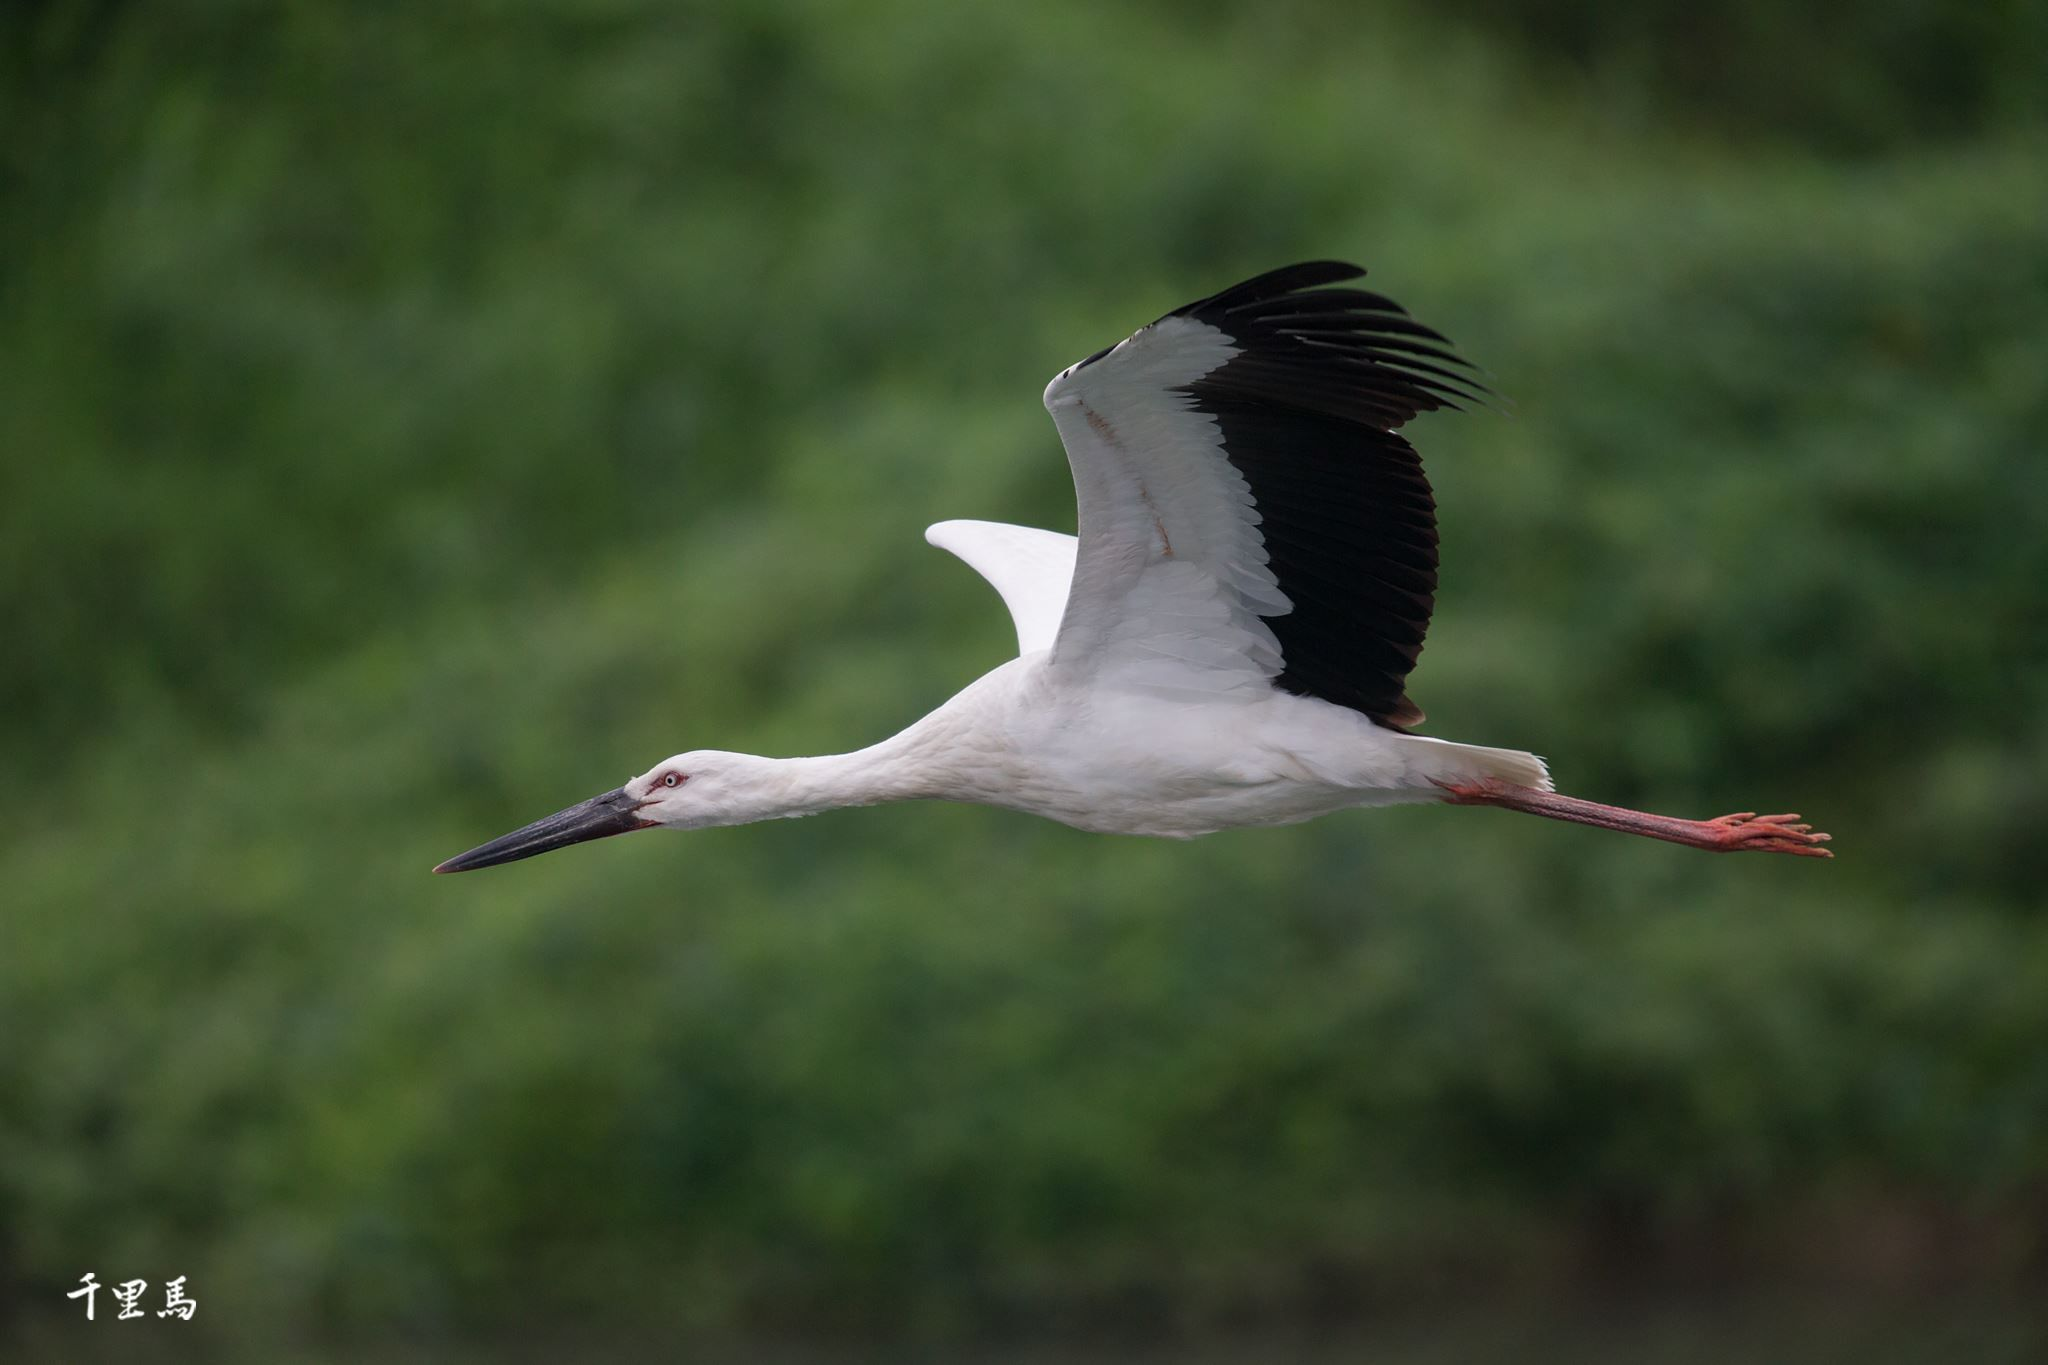 東方白鸛Oriental stork (Ciconia boyciana). Photo: Lima Chin